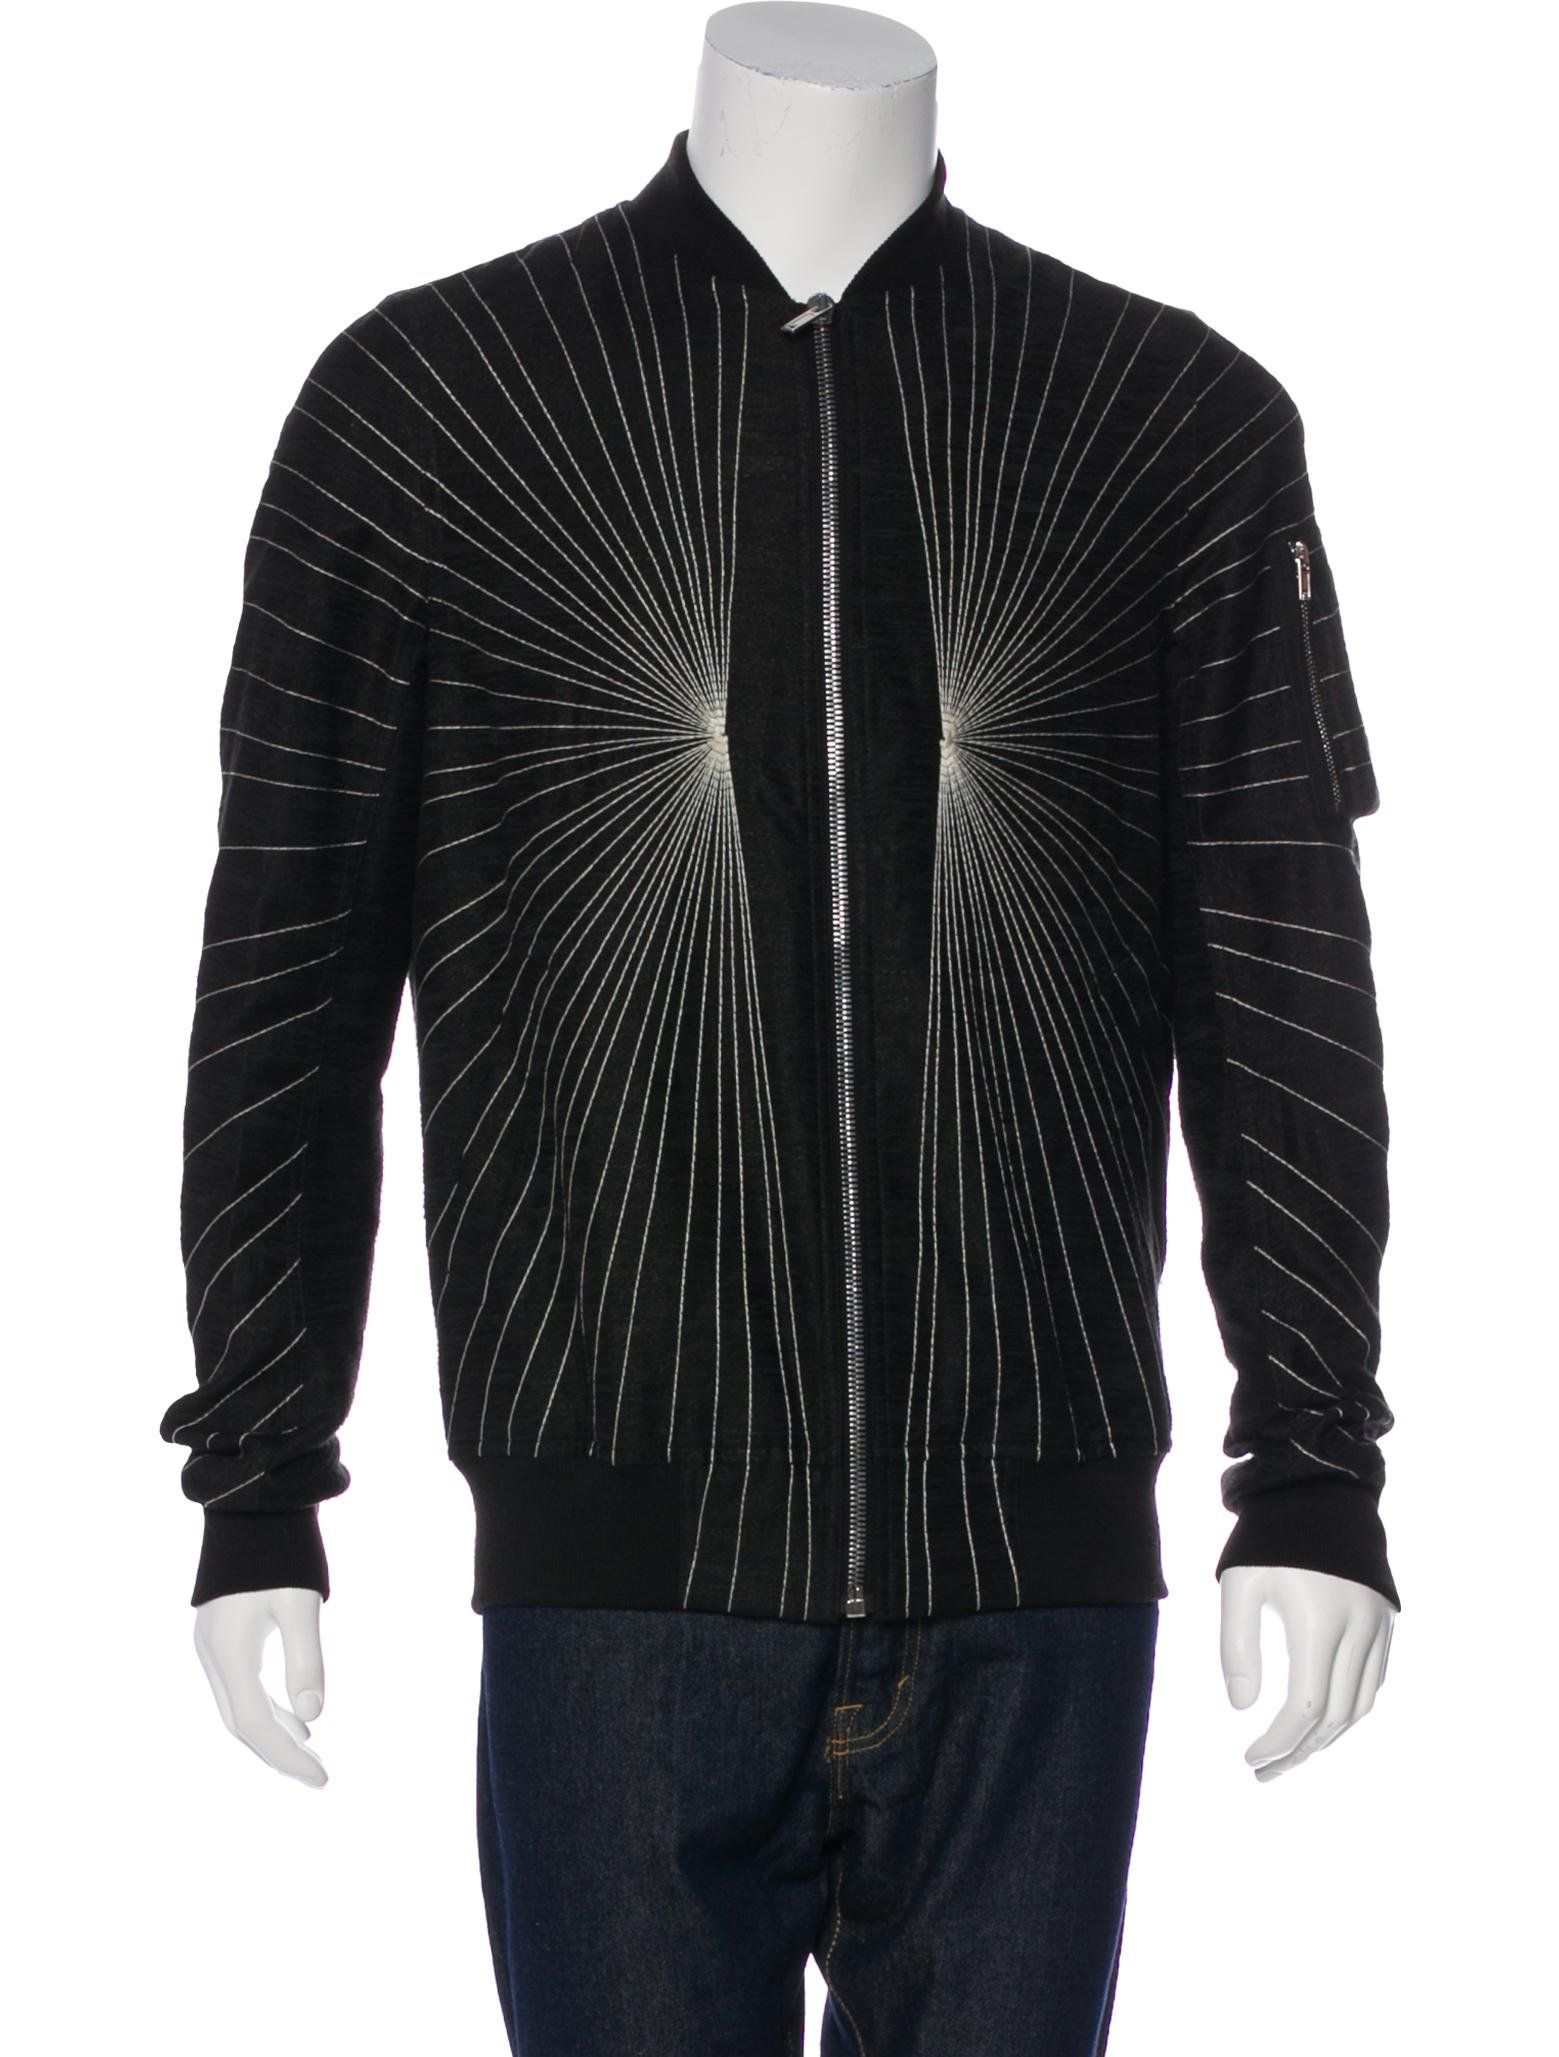 RICK OWENS 2017 LinenBlend Embroidered Bomber Jacket